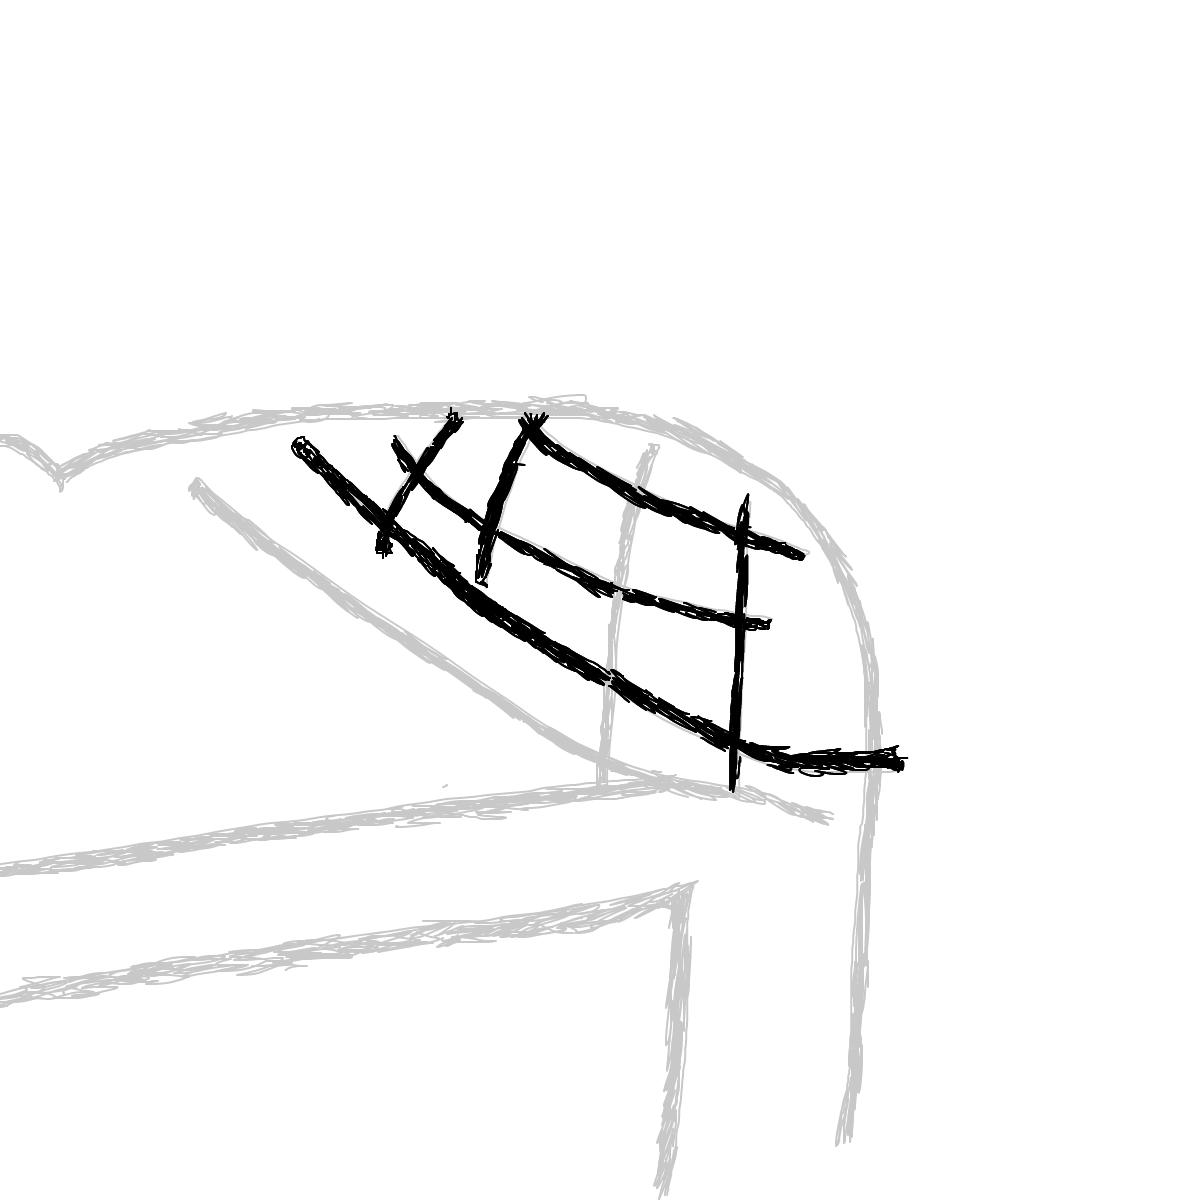 BAAAM drawing#23379 lat:46.5209426879882800lng: 6.6340675354003910